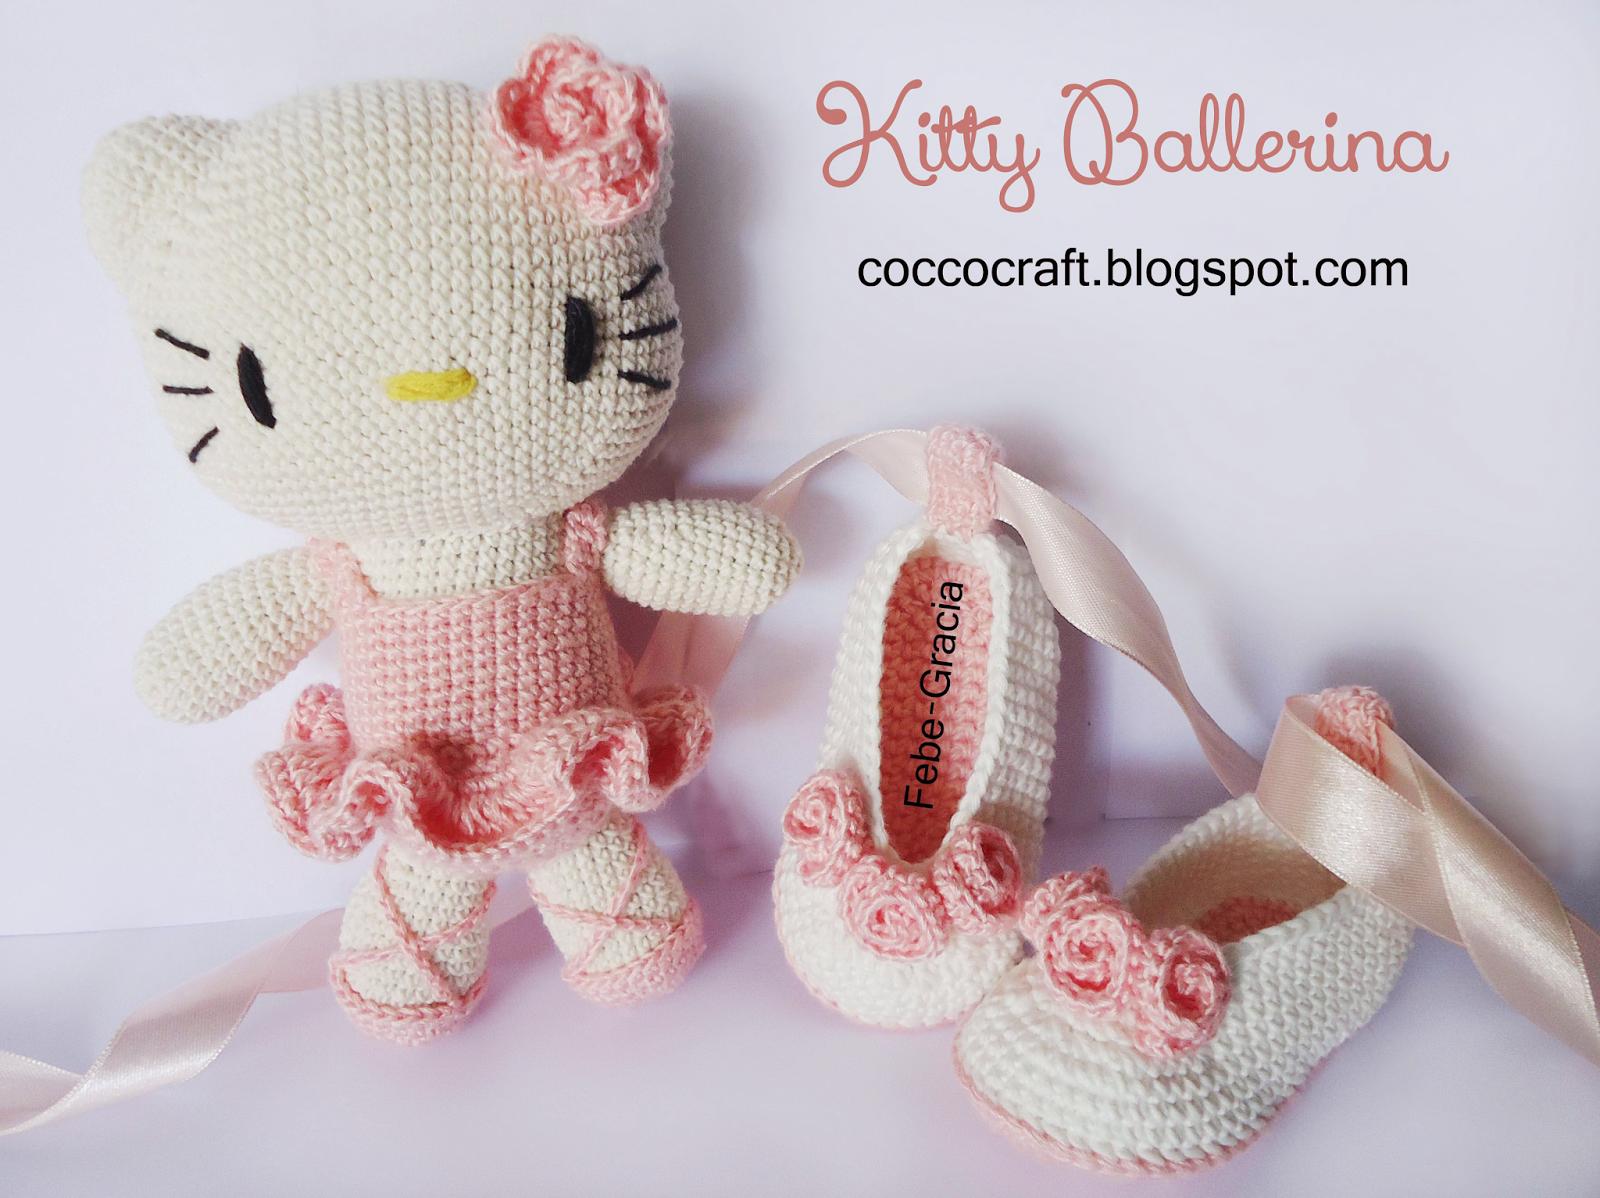 Kitty Ballerina Amigurumi And Baby Shoes Crochet Pattern ...